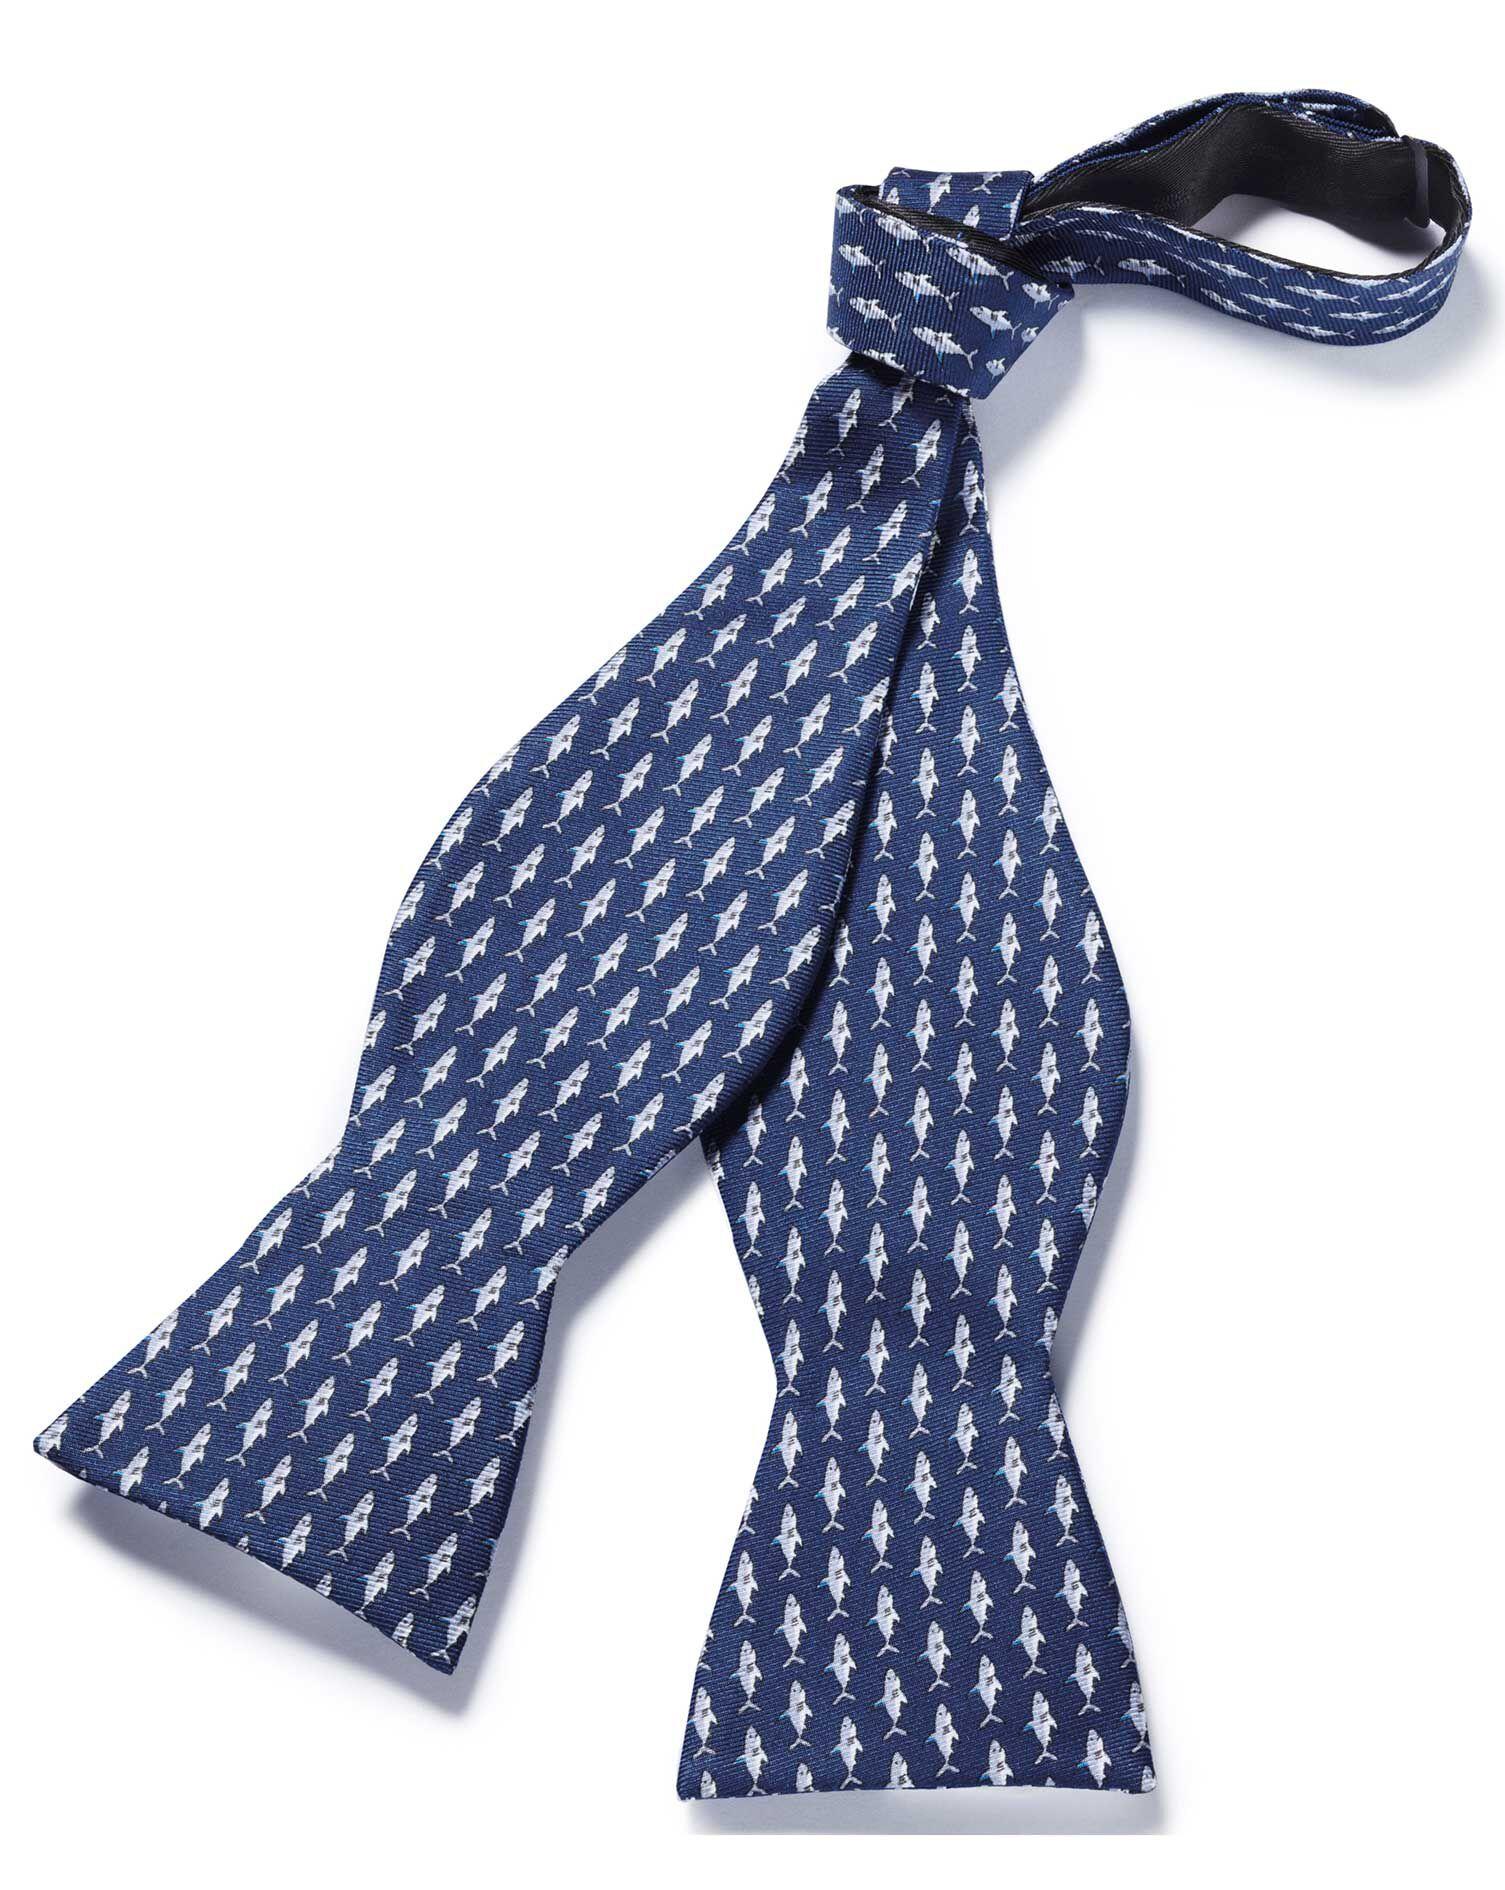 Navy Shark Print Self Tie Silk Bow Tie Size OSFA by Charles Tyrwhitt